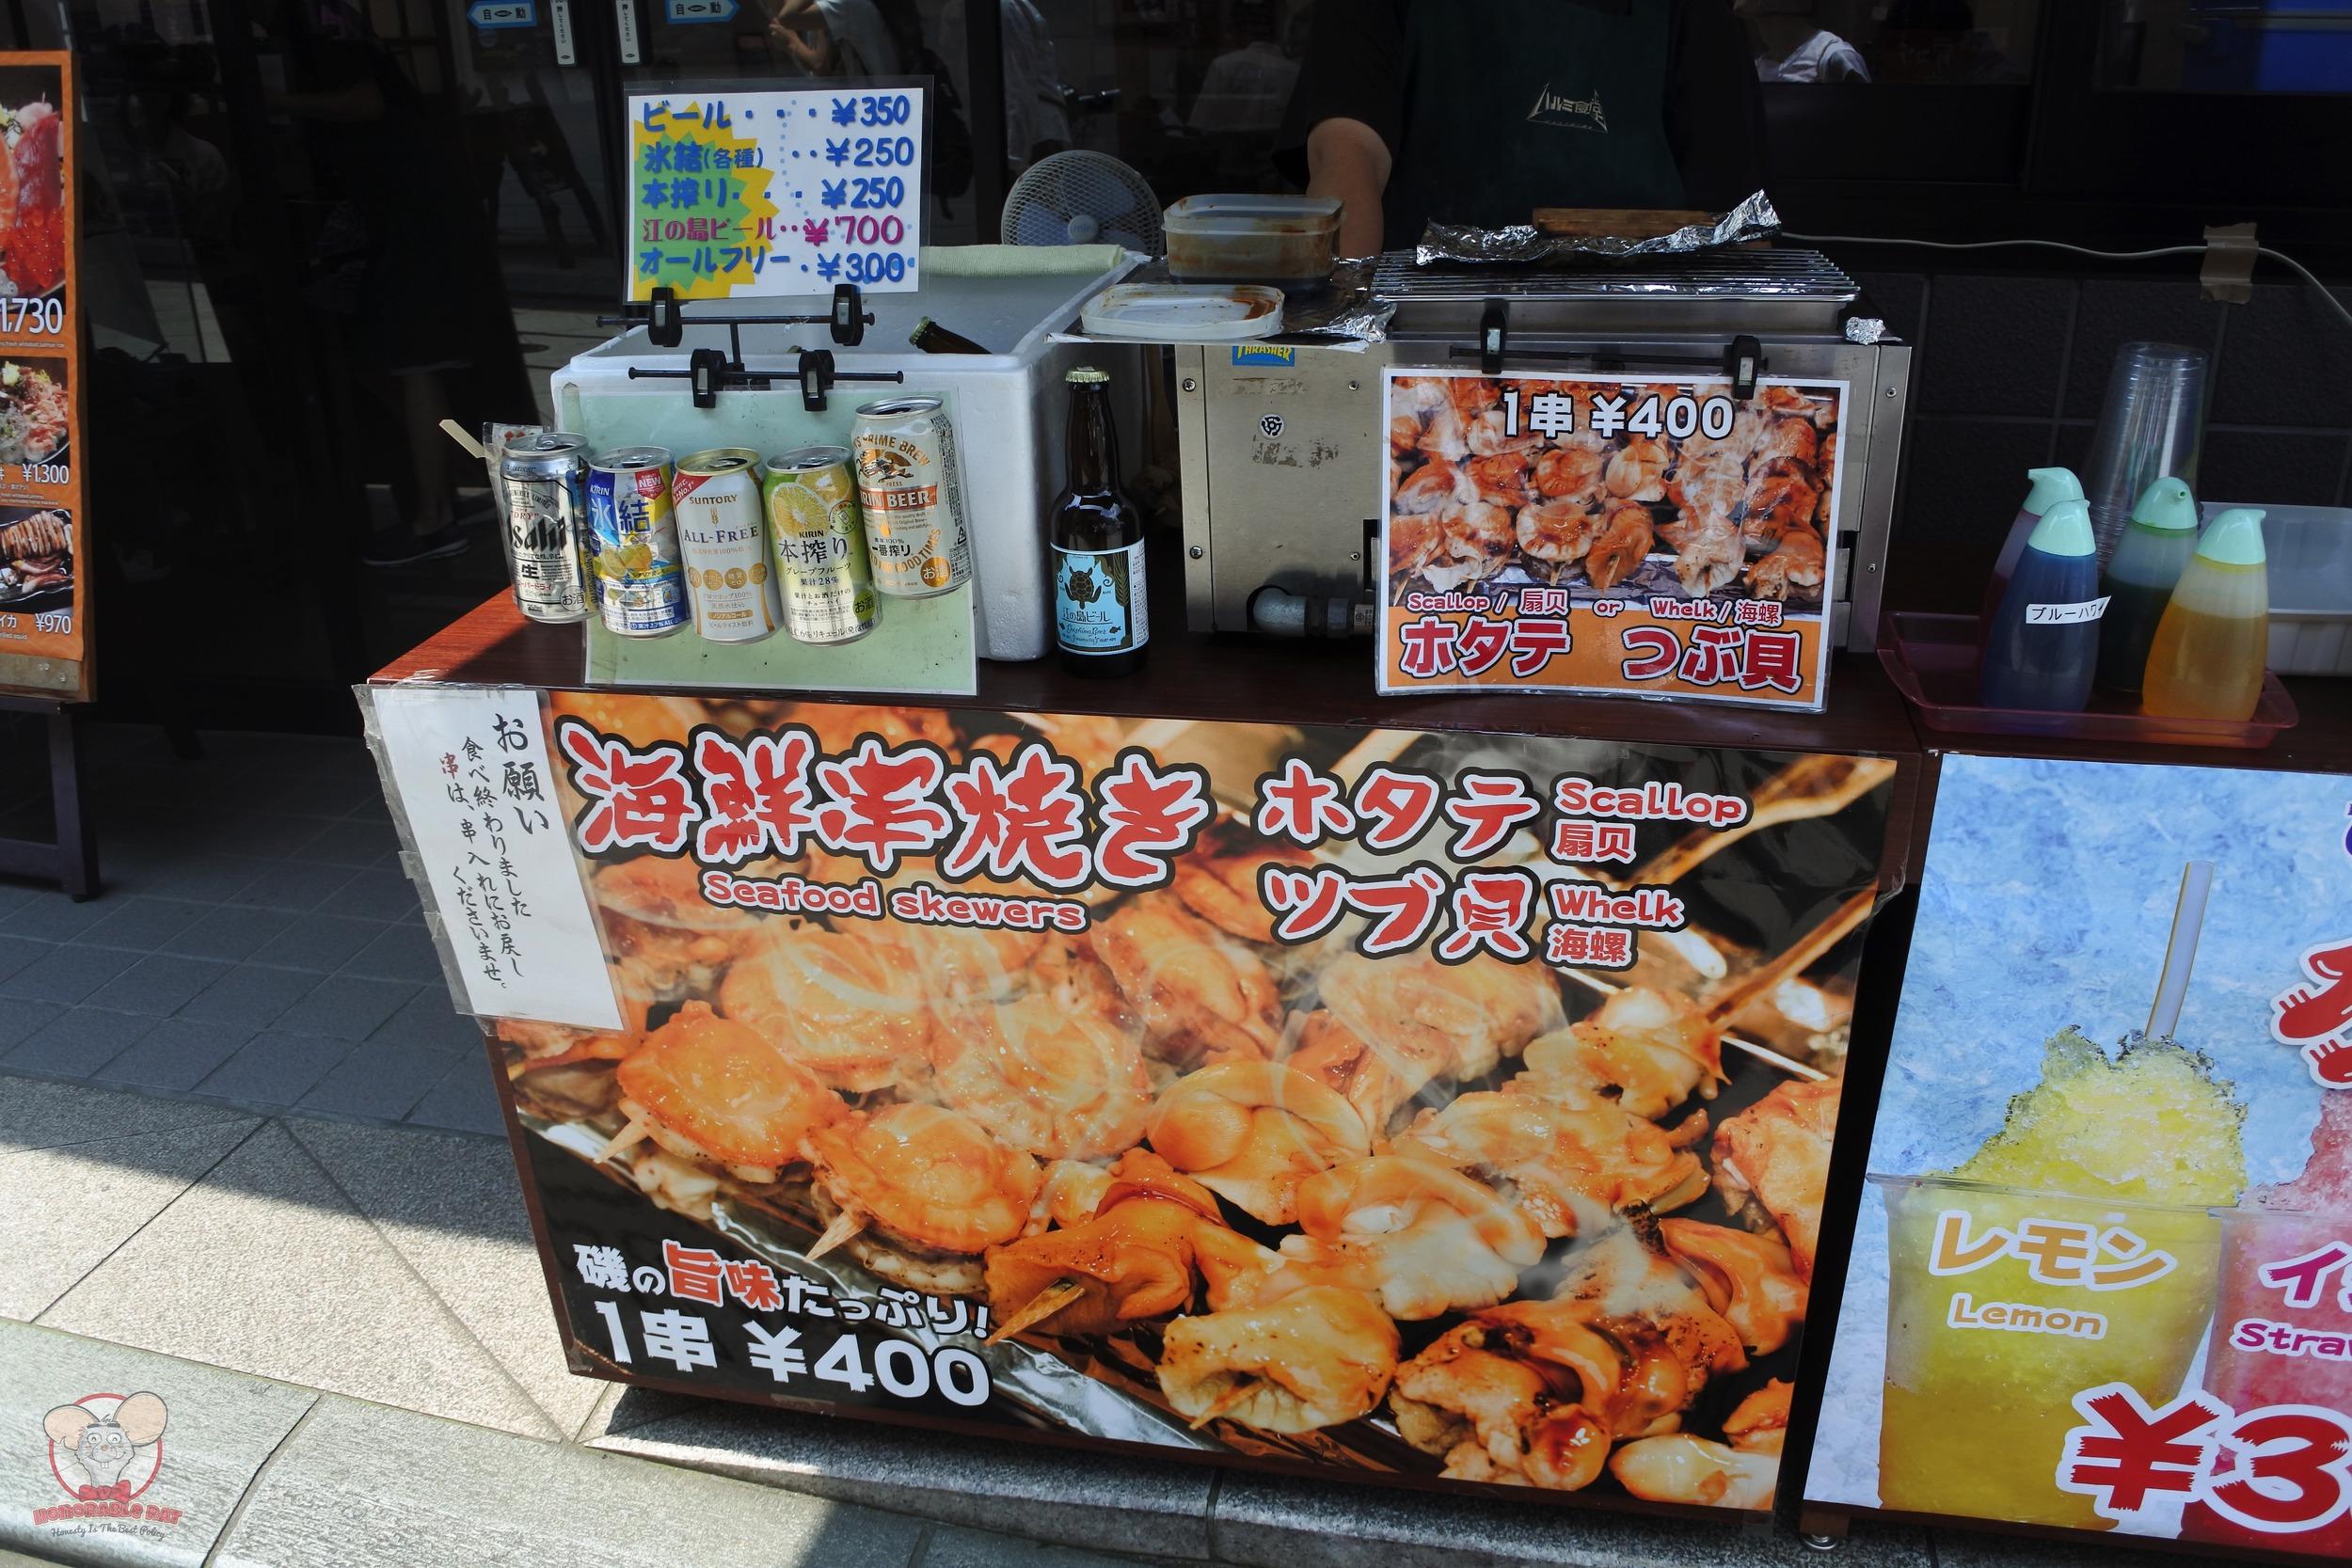 Stall outside Harumi Shokudou selling Seafood Skewers